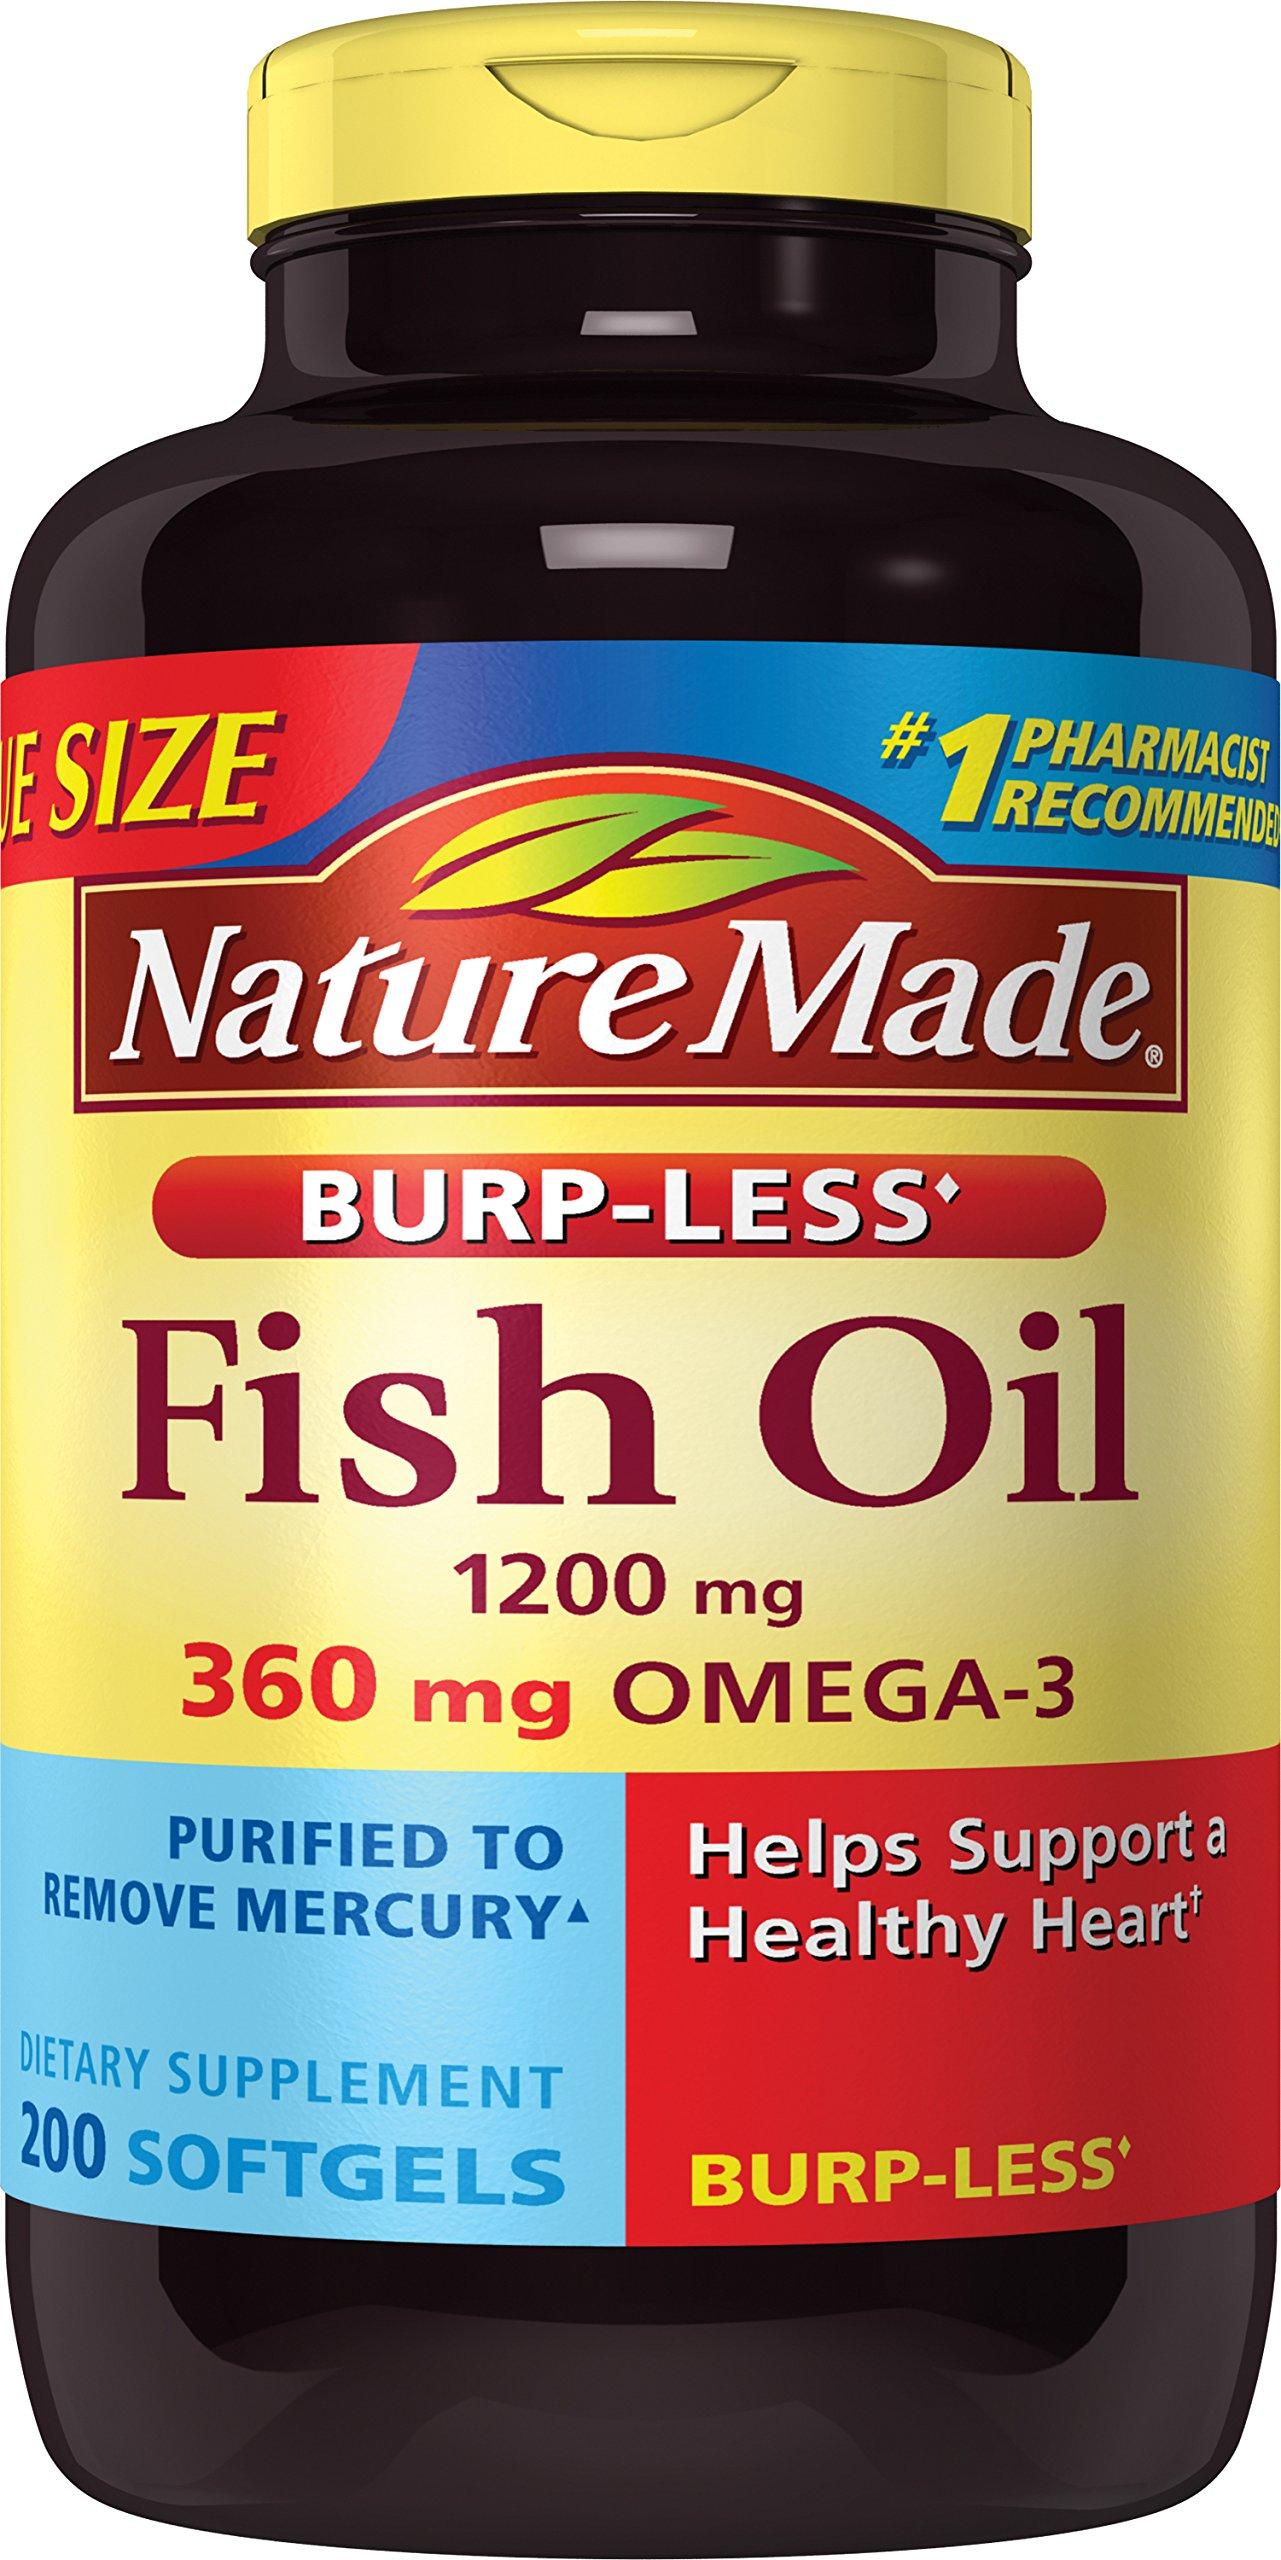 Nature made ginkgo biloba 30mg 200 capsules for Natural made fish oil